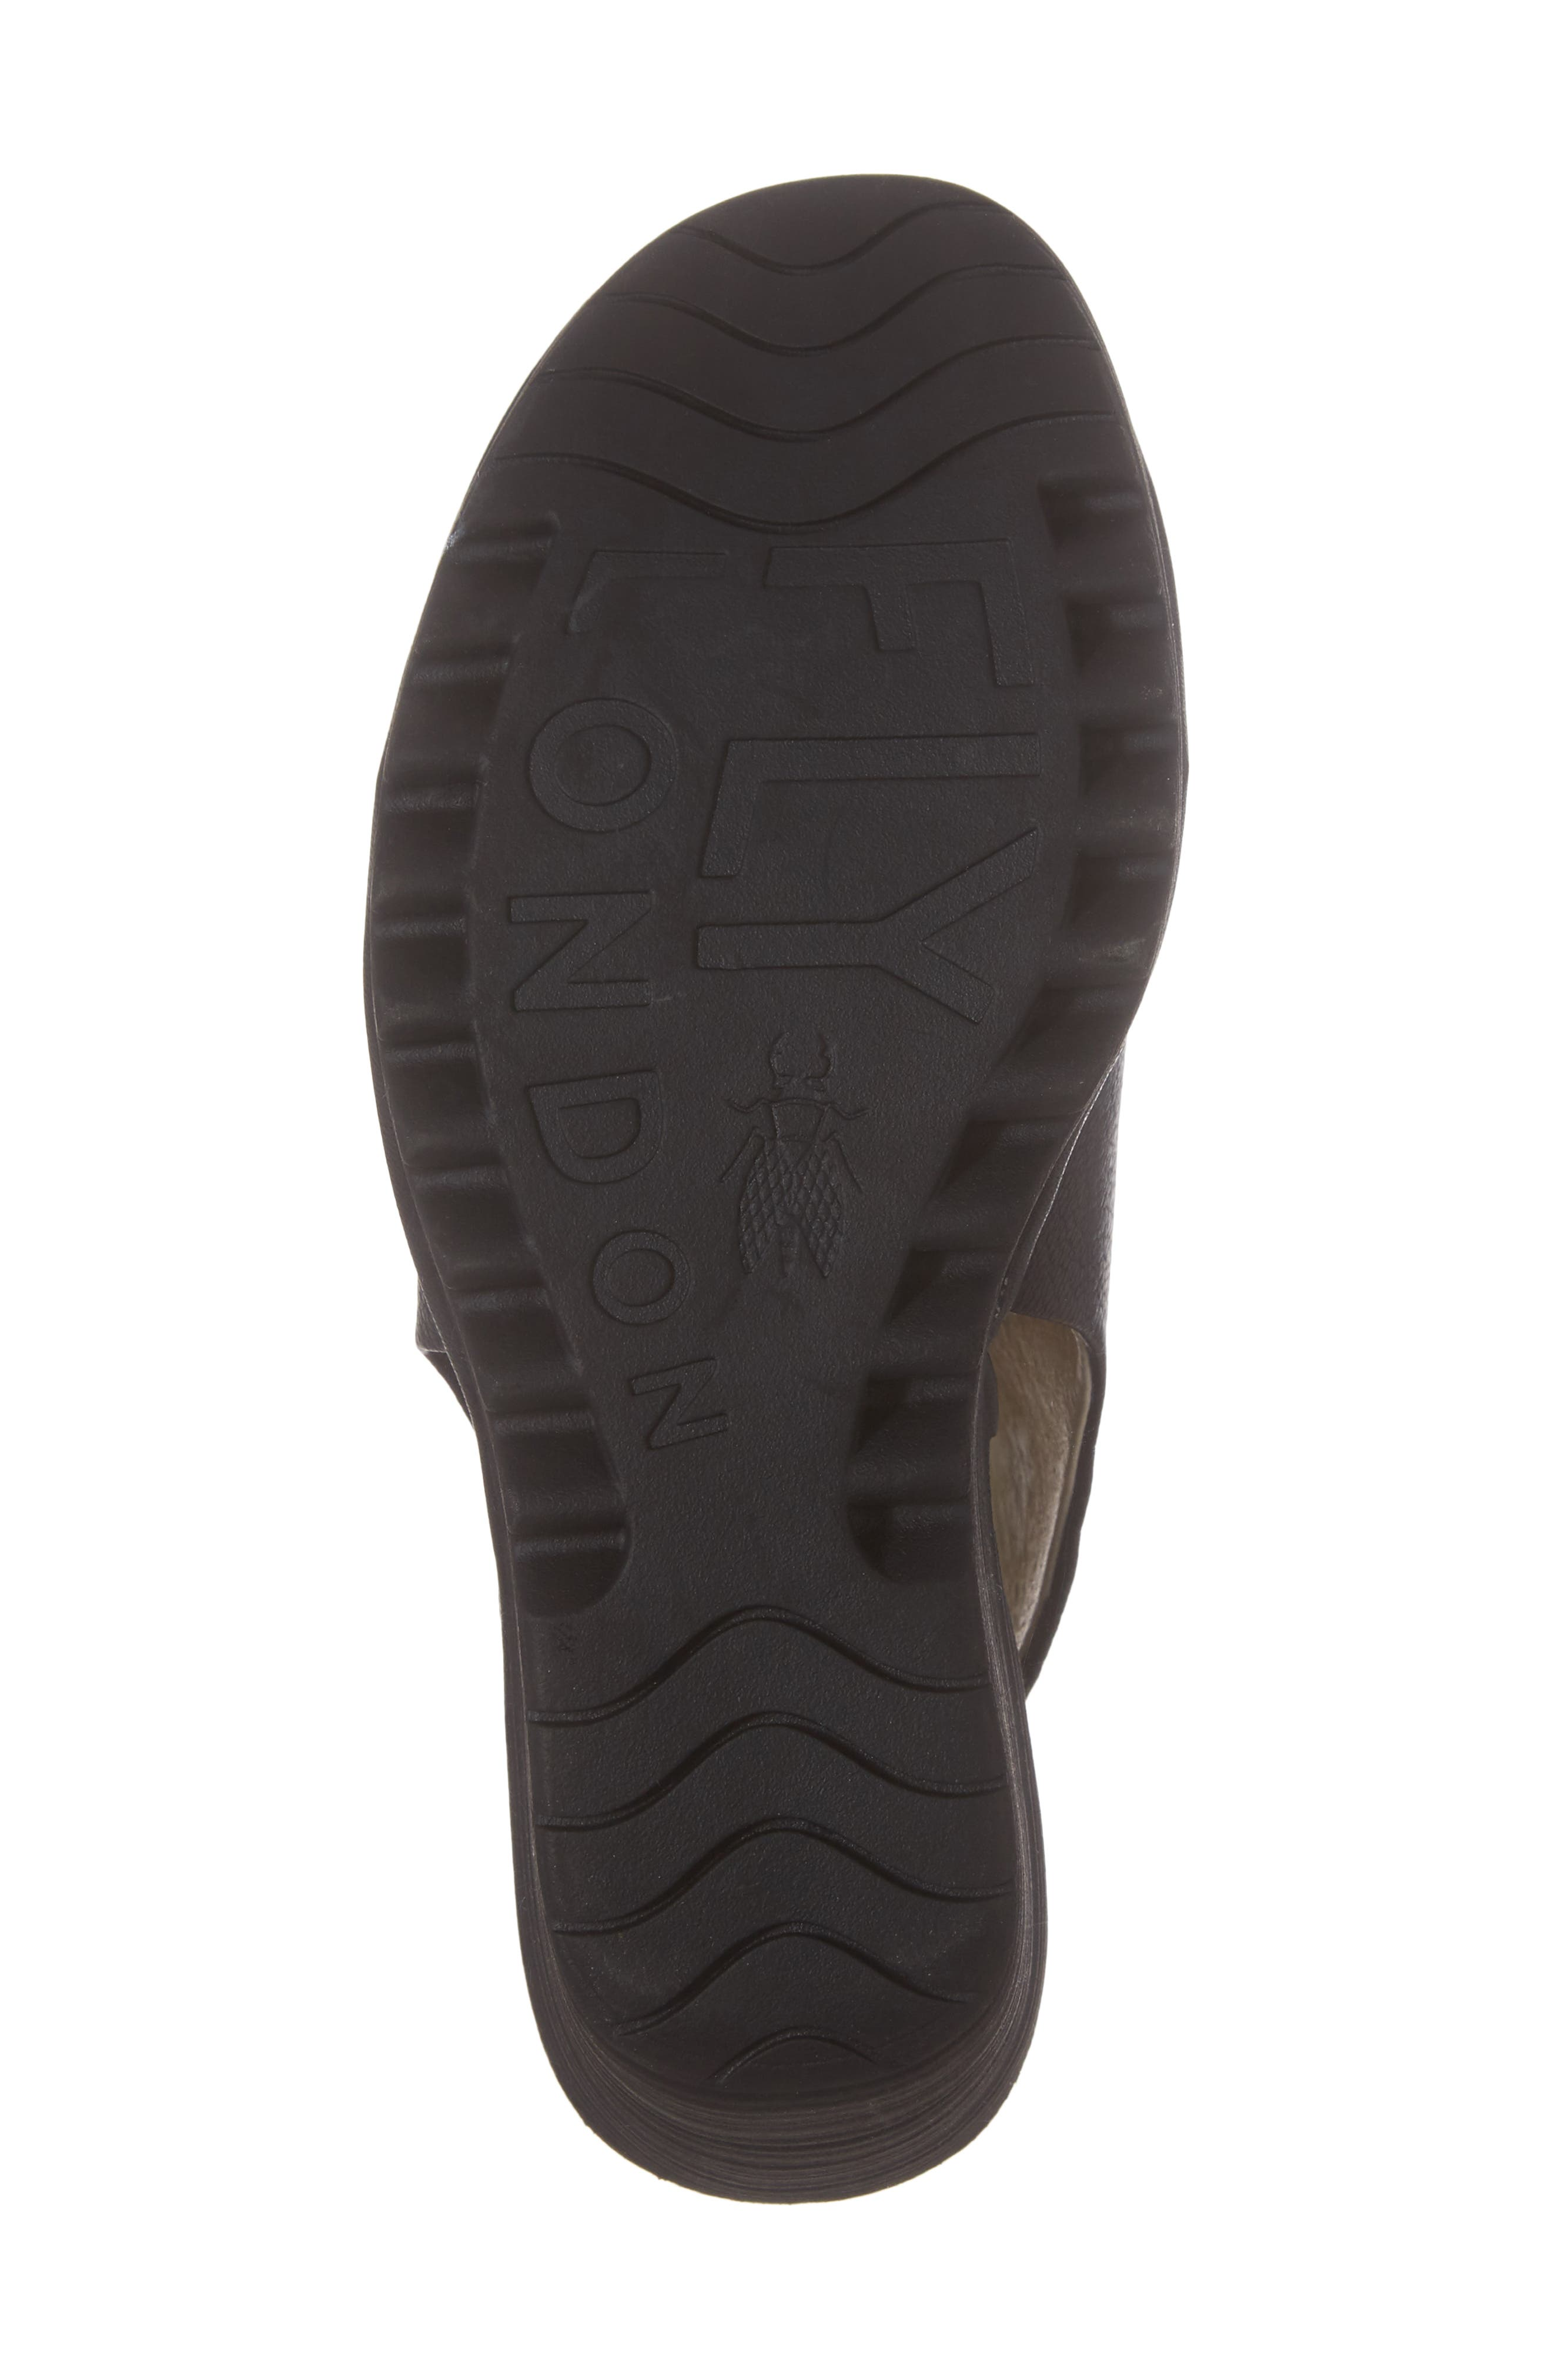 Yuzu Wedge Sandal,                             Alternate thumbnail 6, color,                             Black Mousse Leather